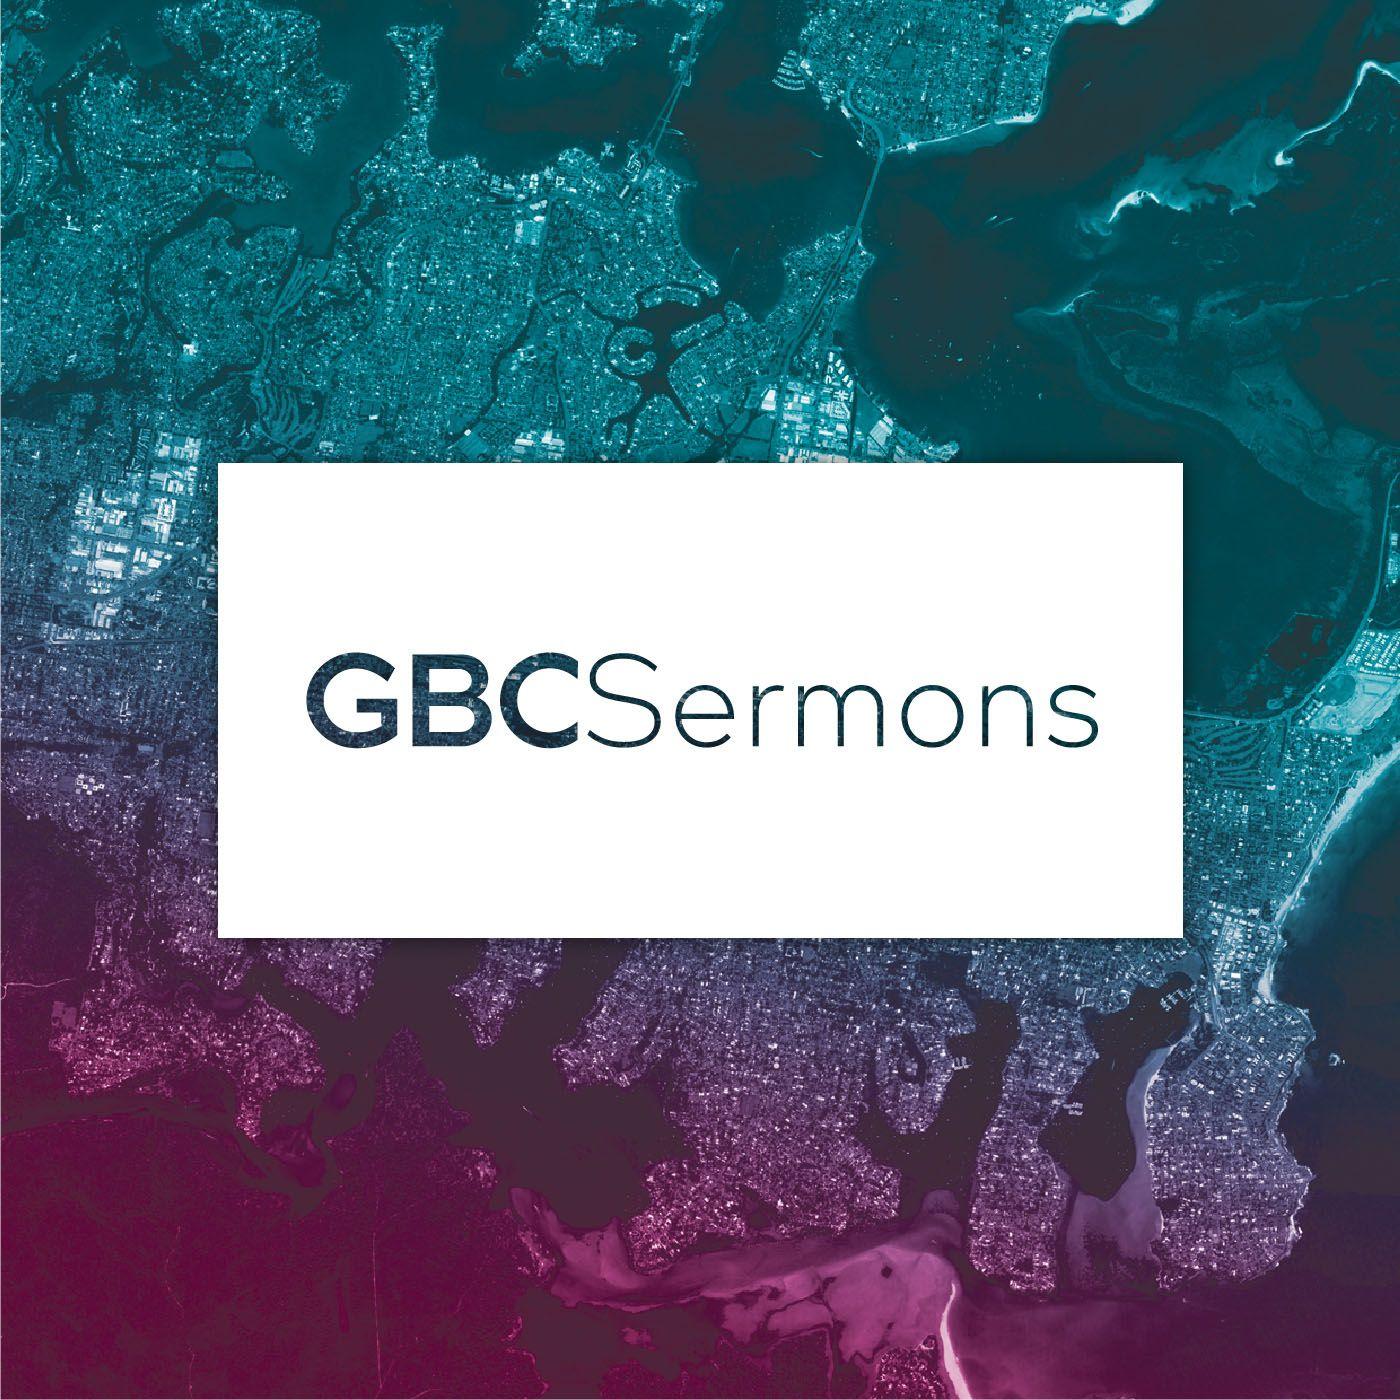 GBC Sermons podcast show image